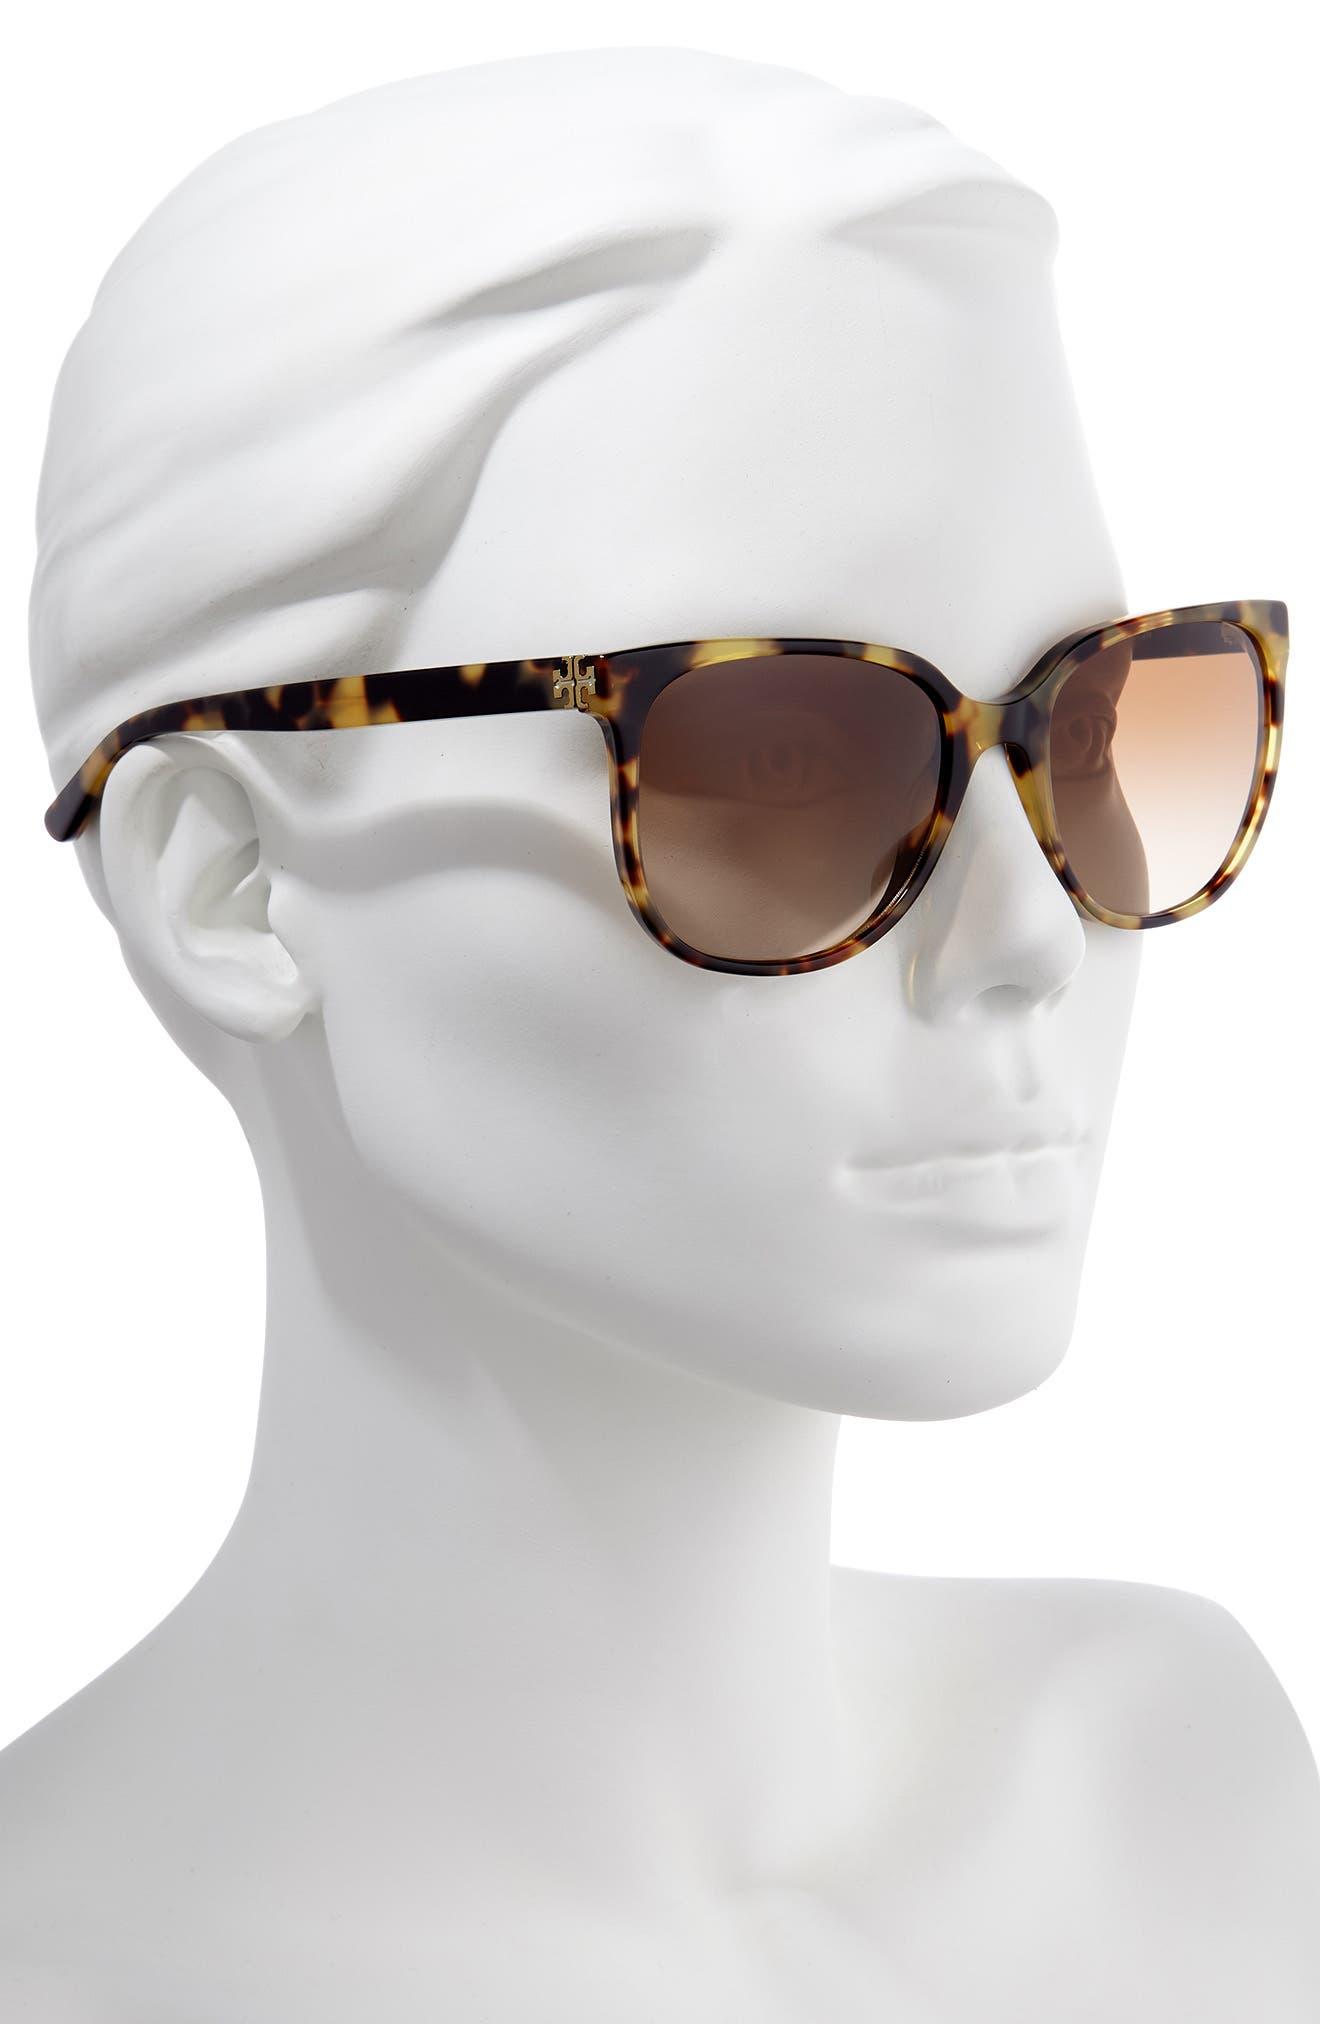 TORY BURCH, 57mm Gradient Sunglasses, Alternate thumbnail 2, color, 205